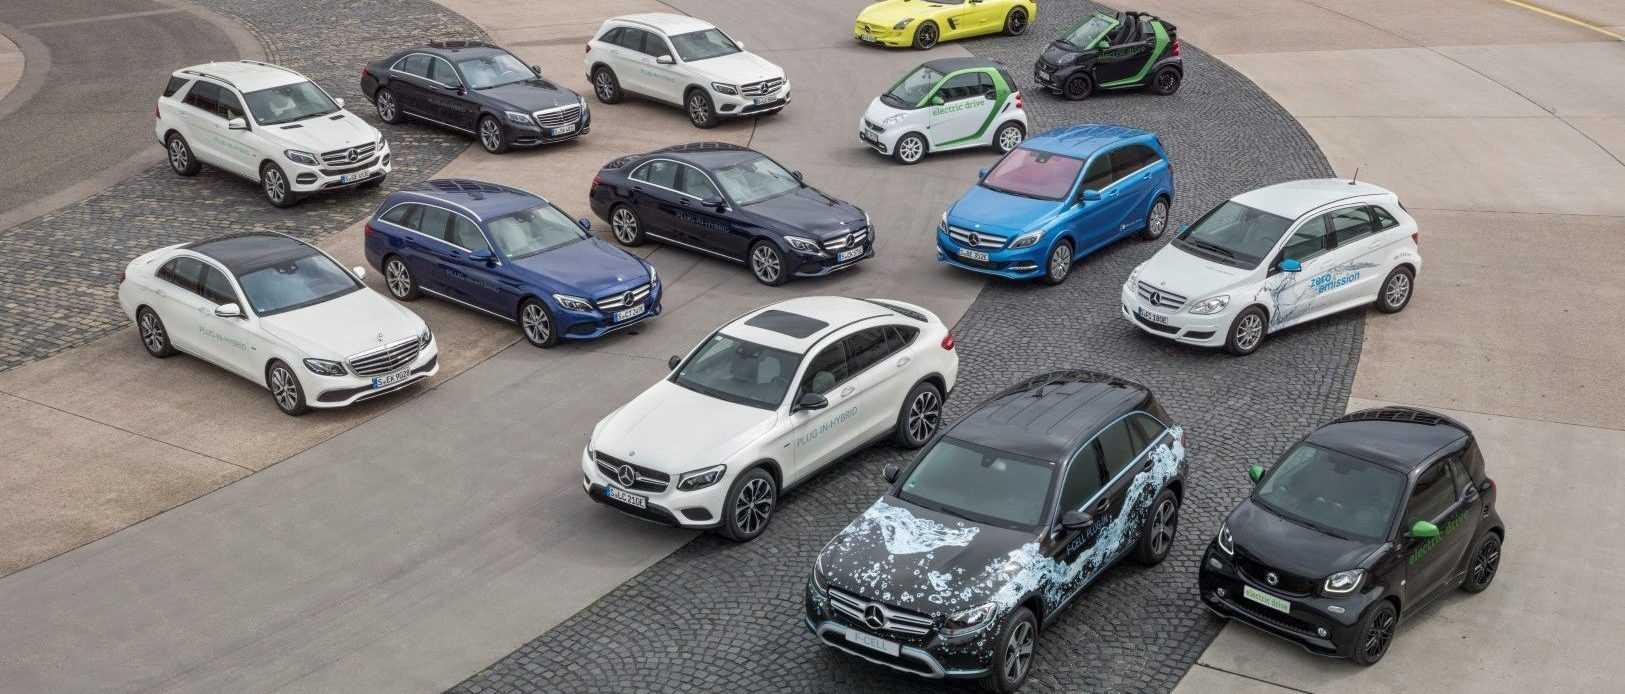 Elektrische modellen Mercedes-Benz & smart 2016